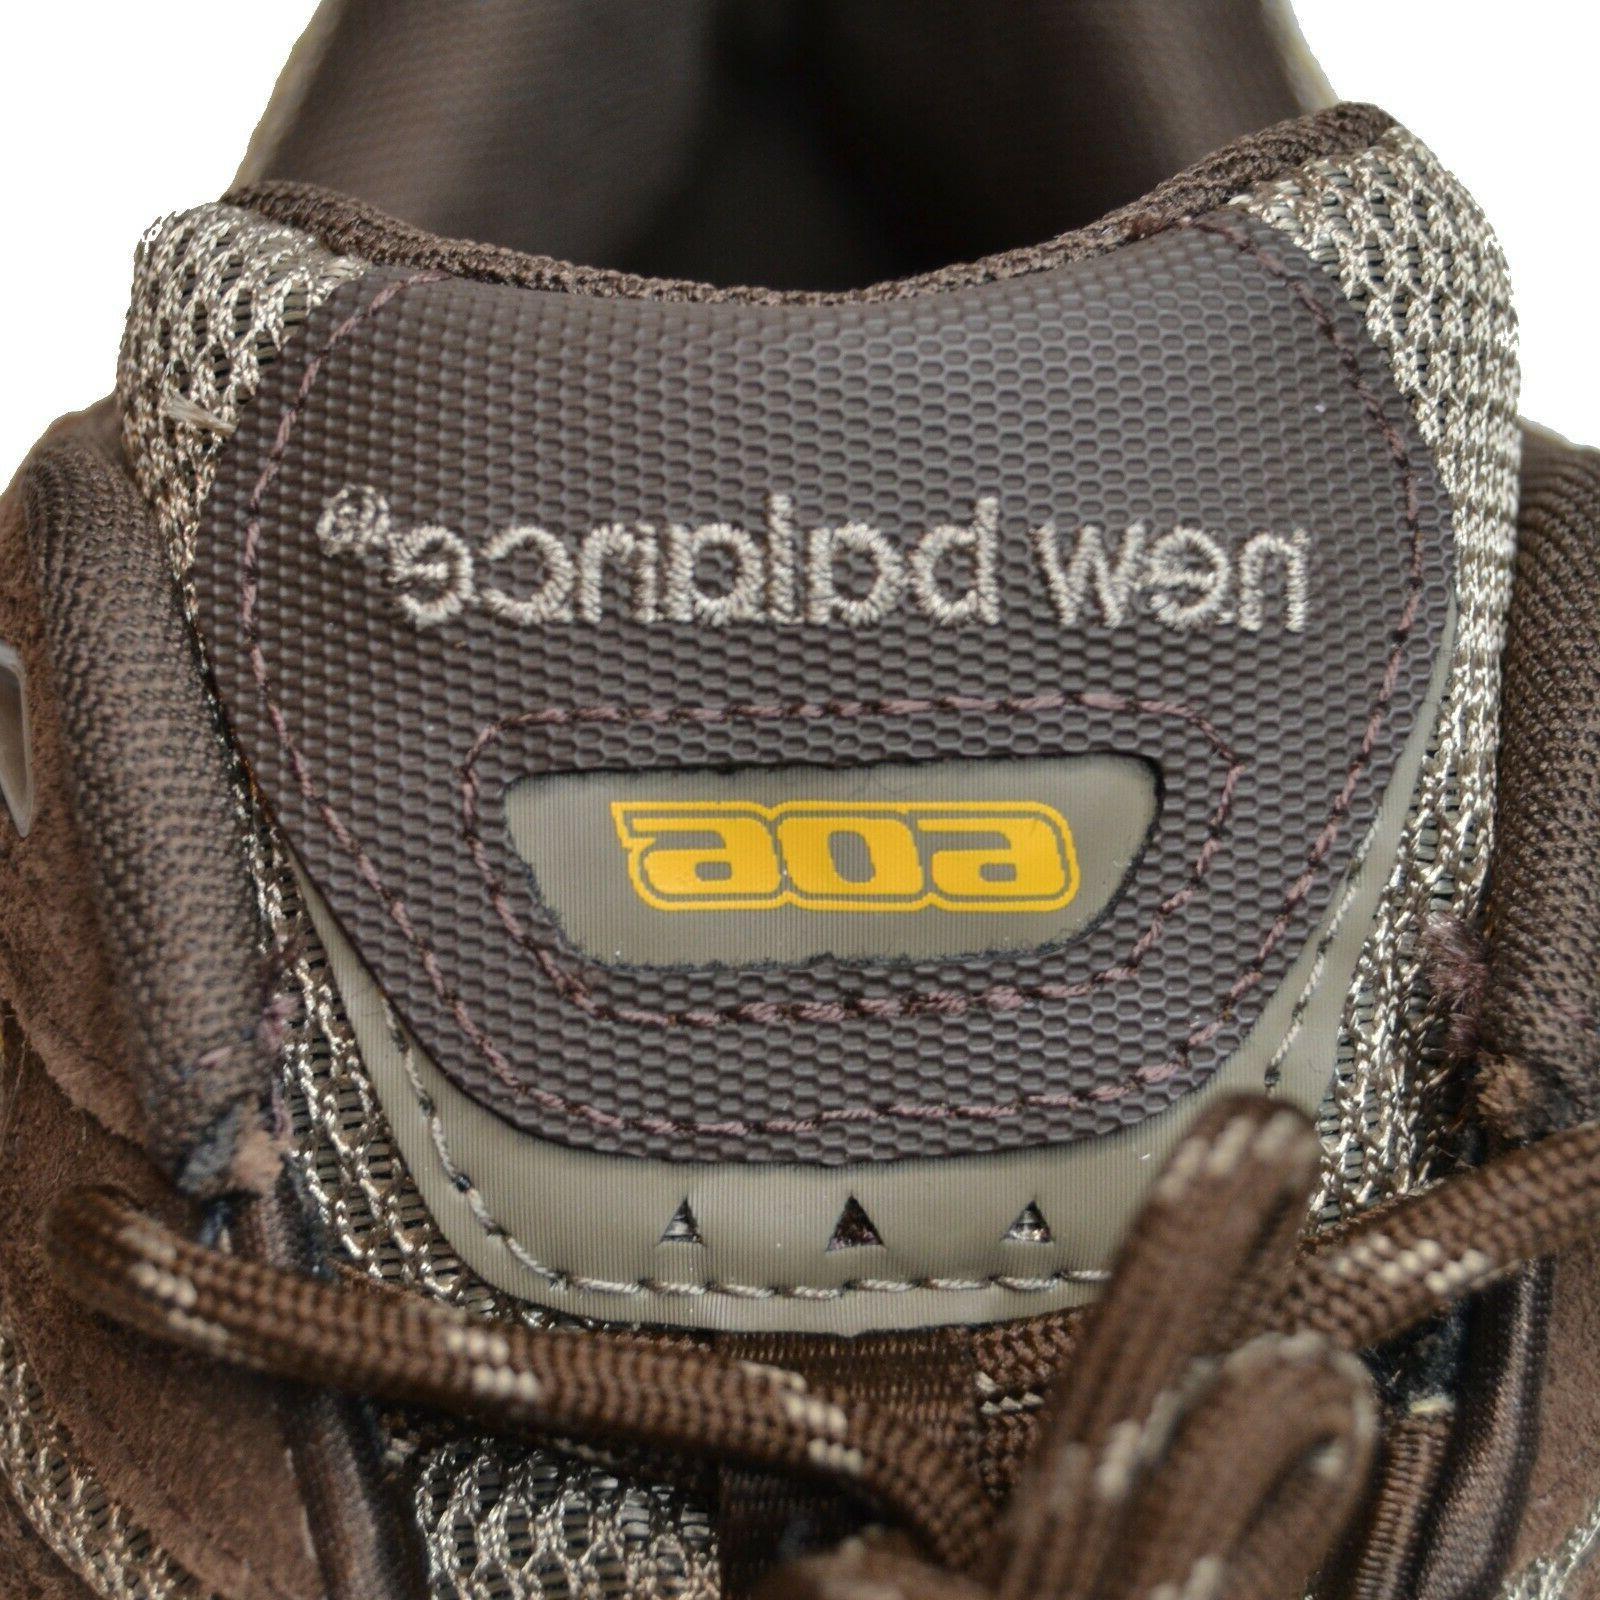 Royaume-Uni disponibilité e0a11 95e03 New Balance 606 MW606BR Men's Hiking Boots Size